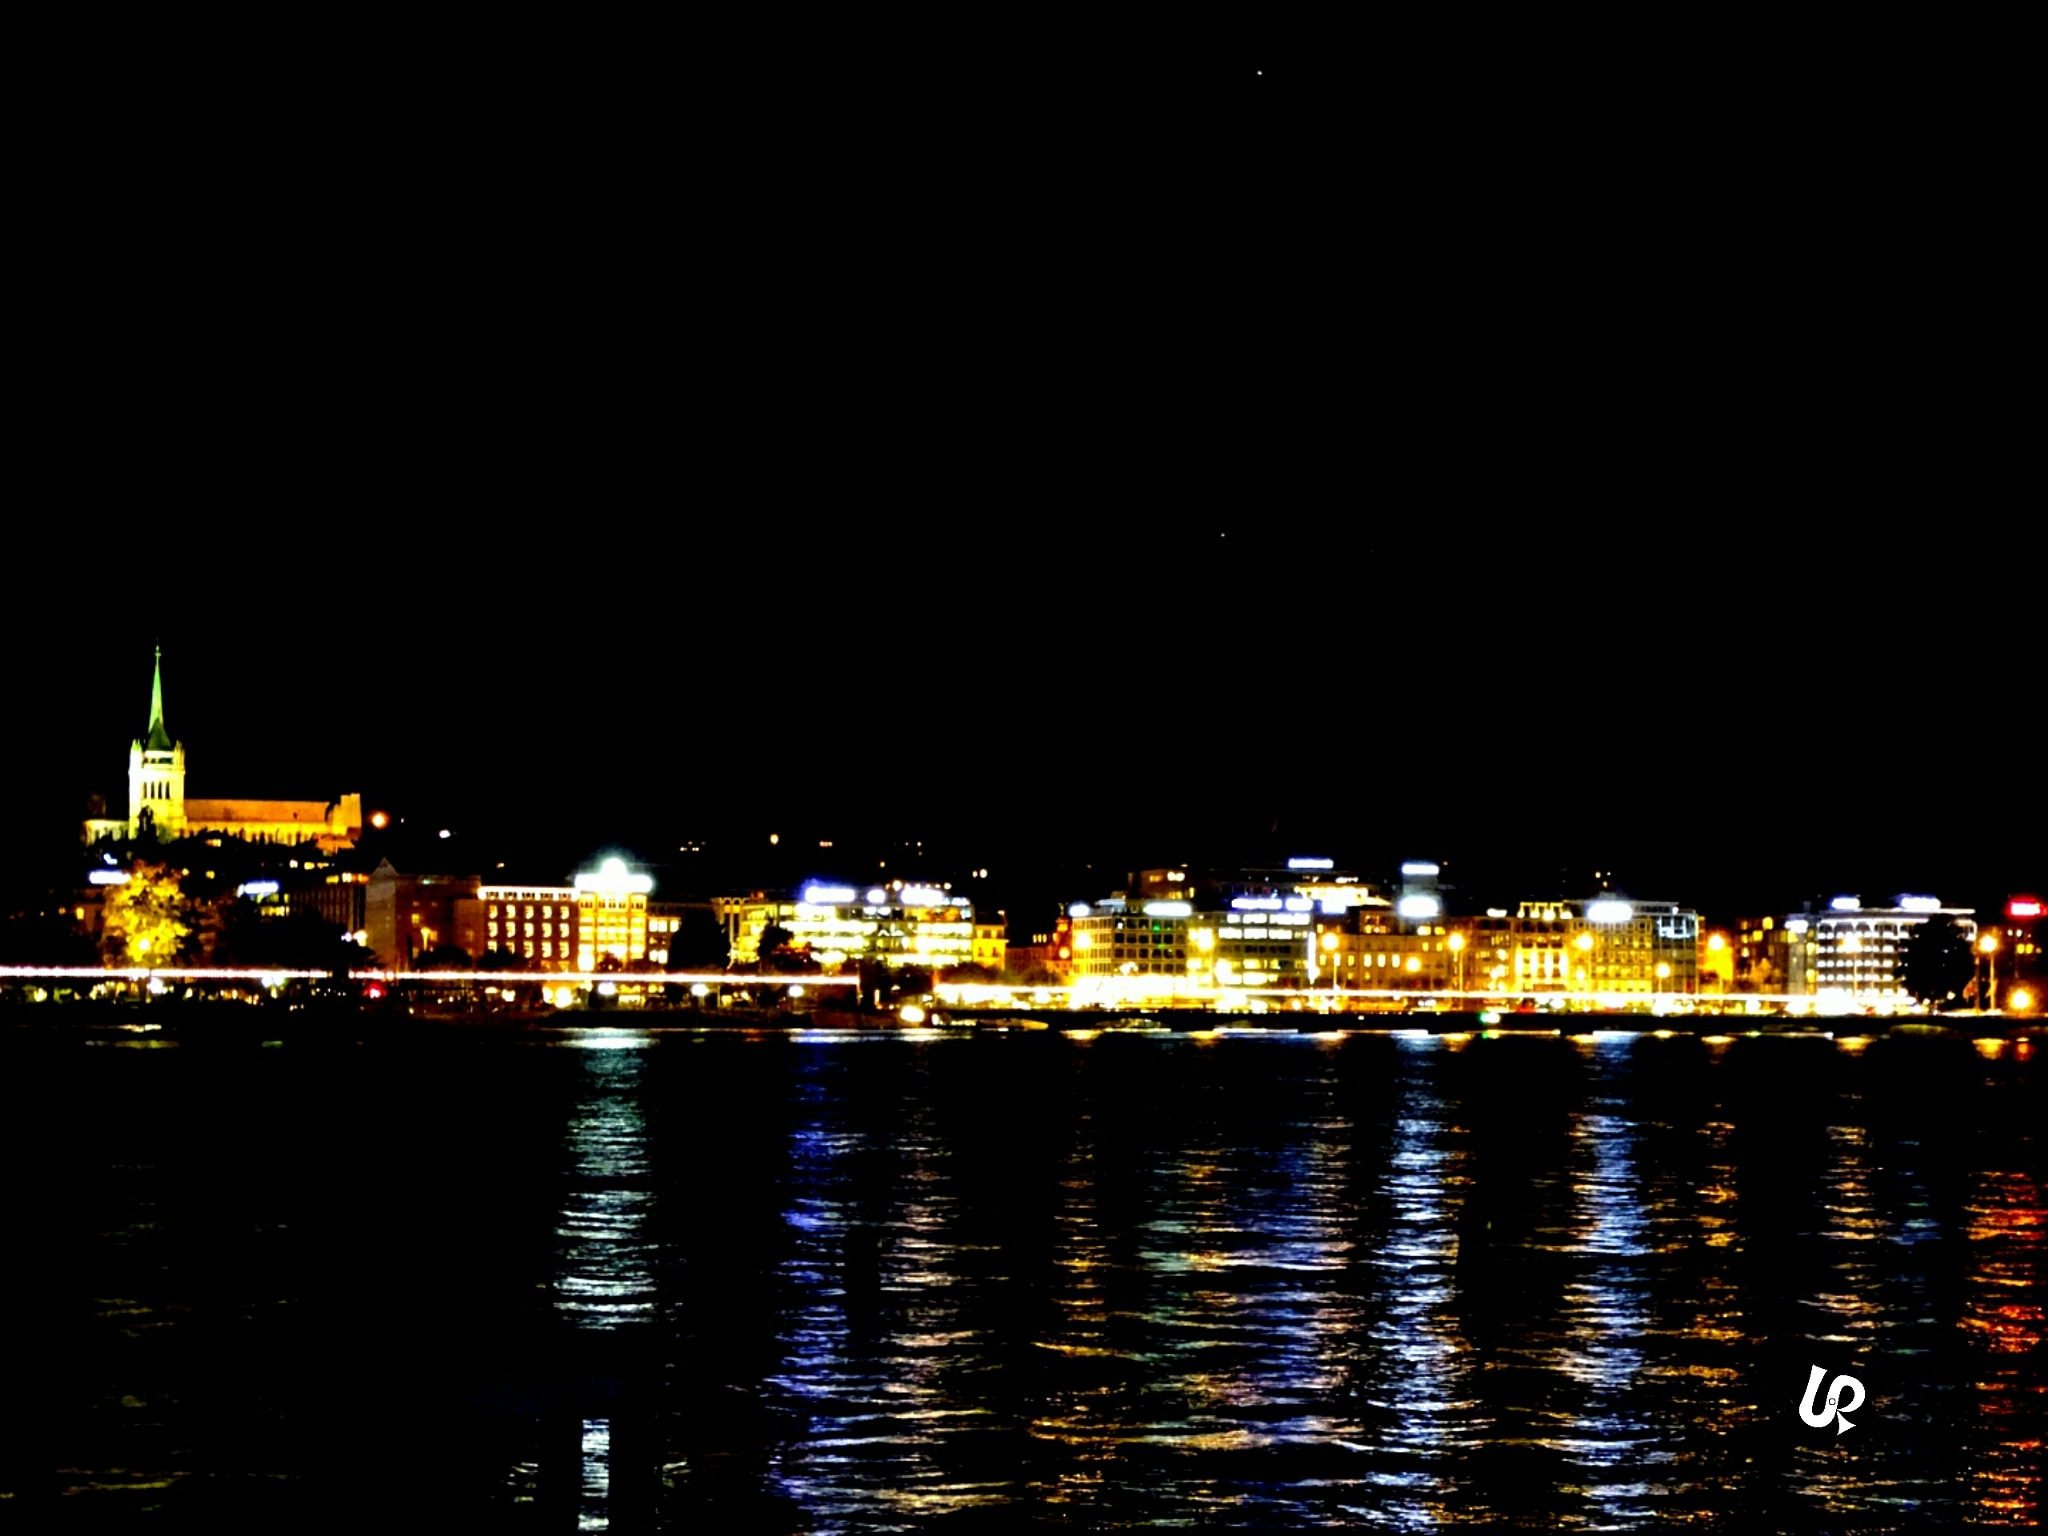 One night in Geneva  by Isa Bel